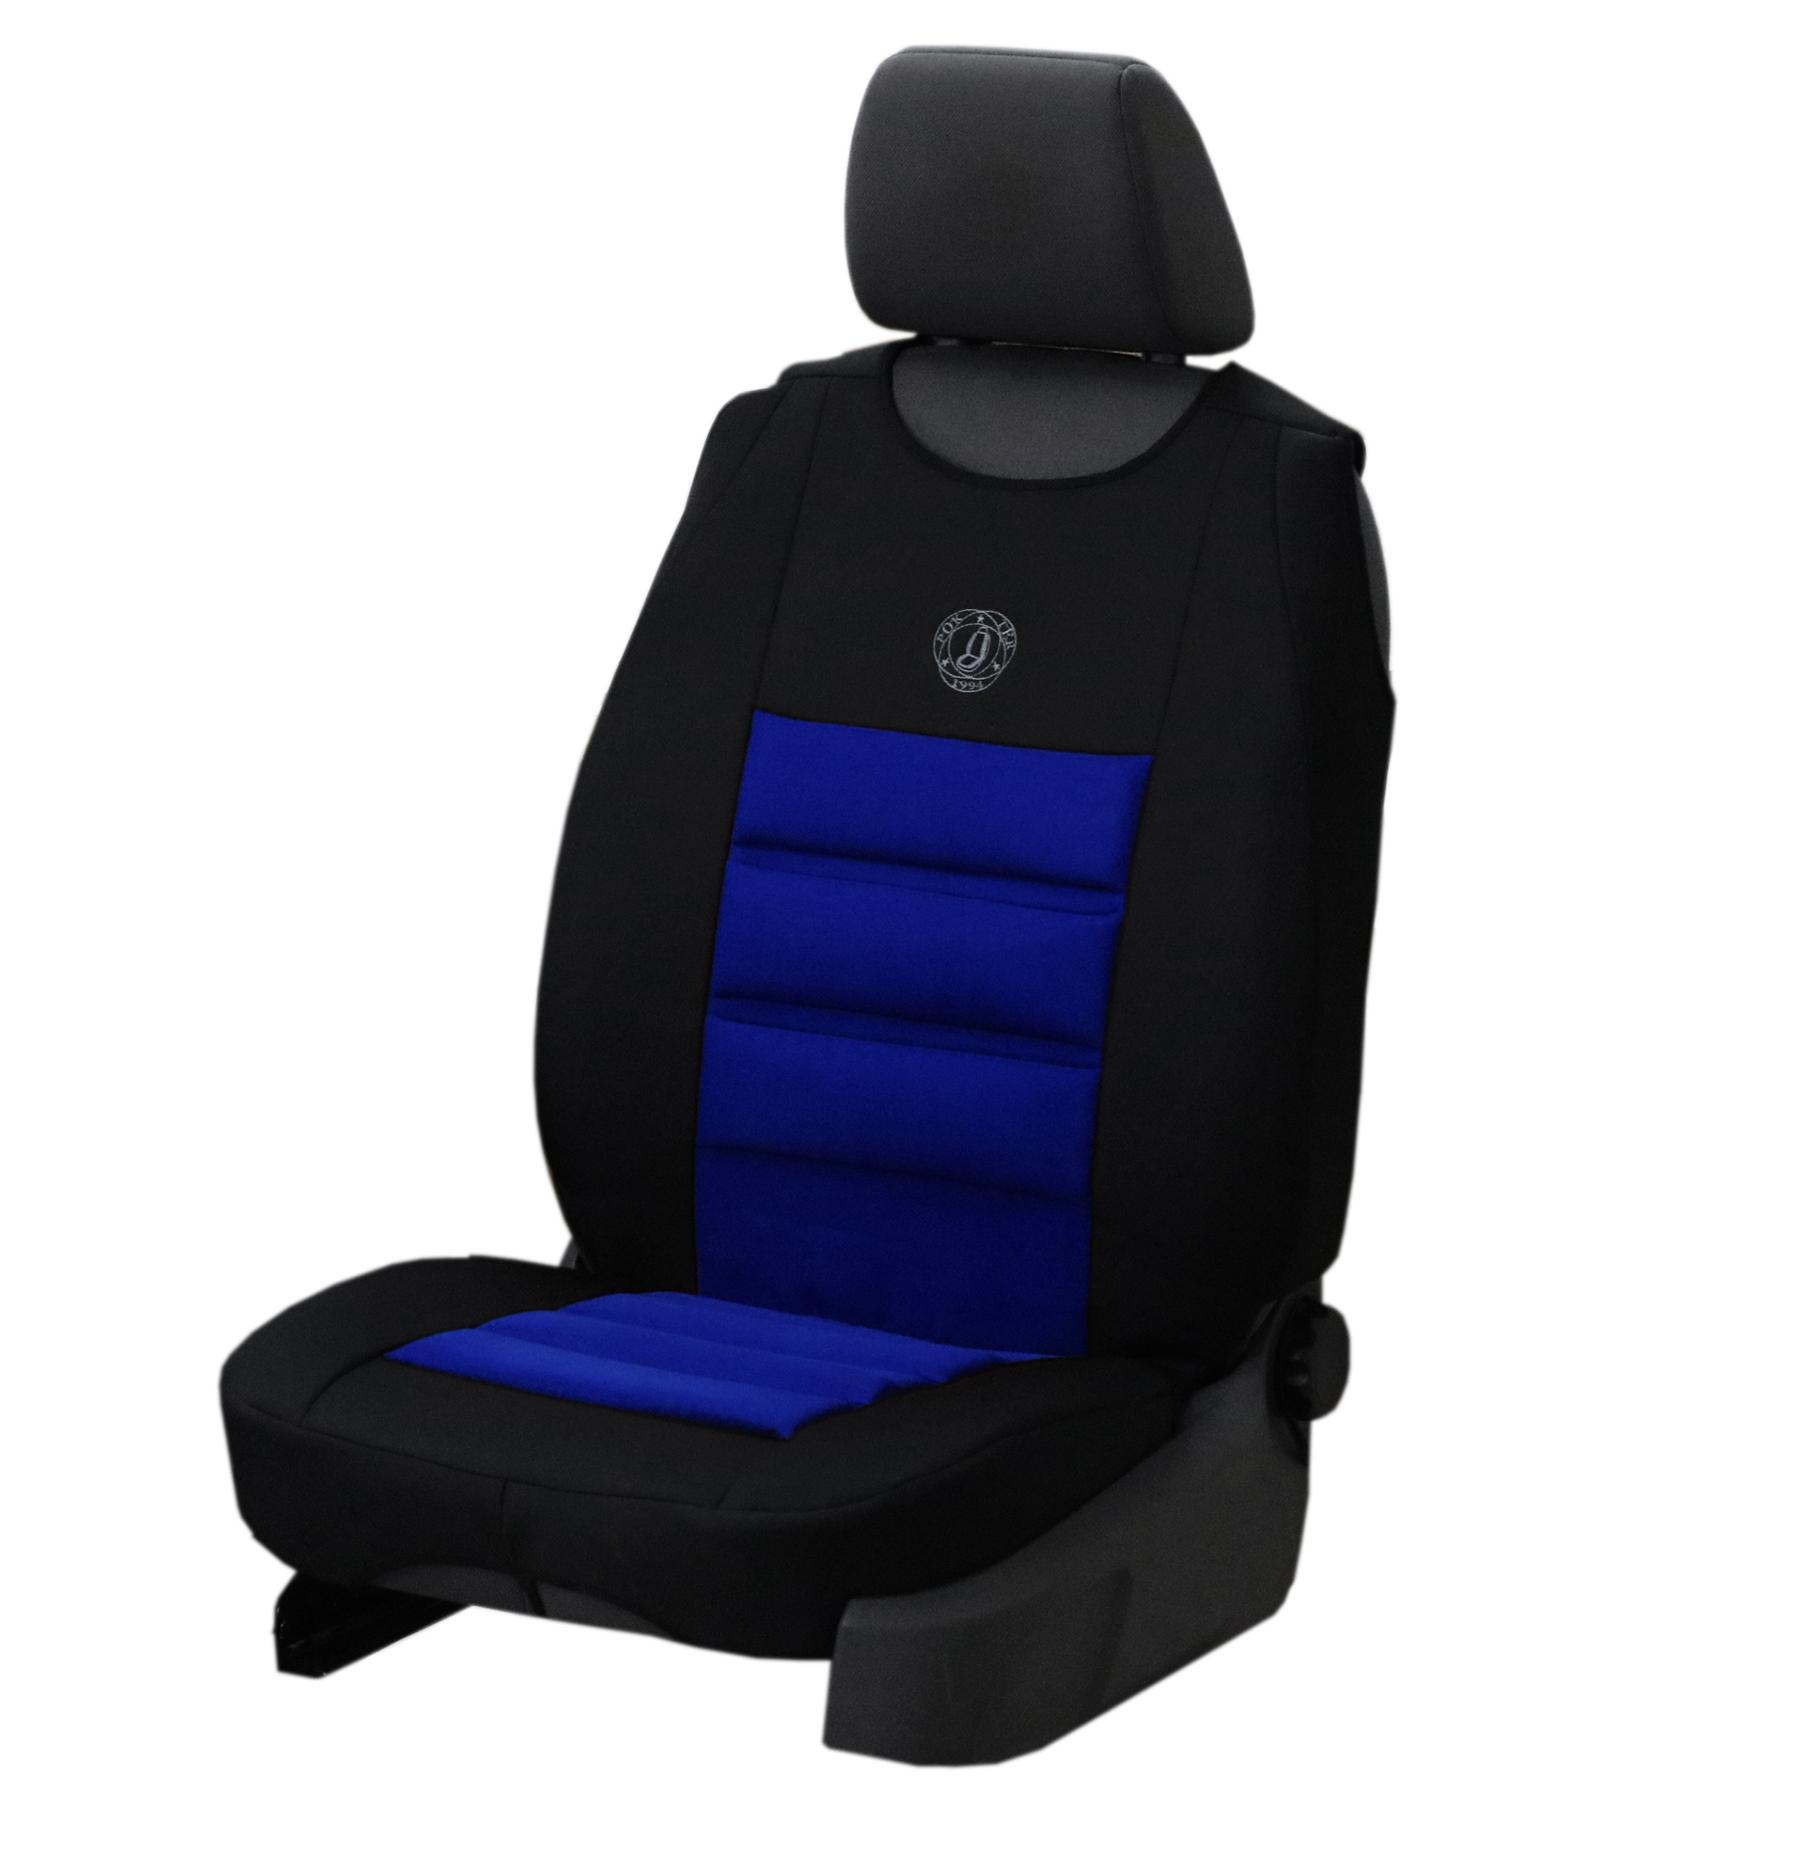 Automega Ergonomický potah na 1 sedadlo ERGONOMIC, modrý